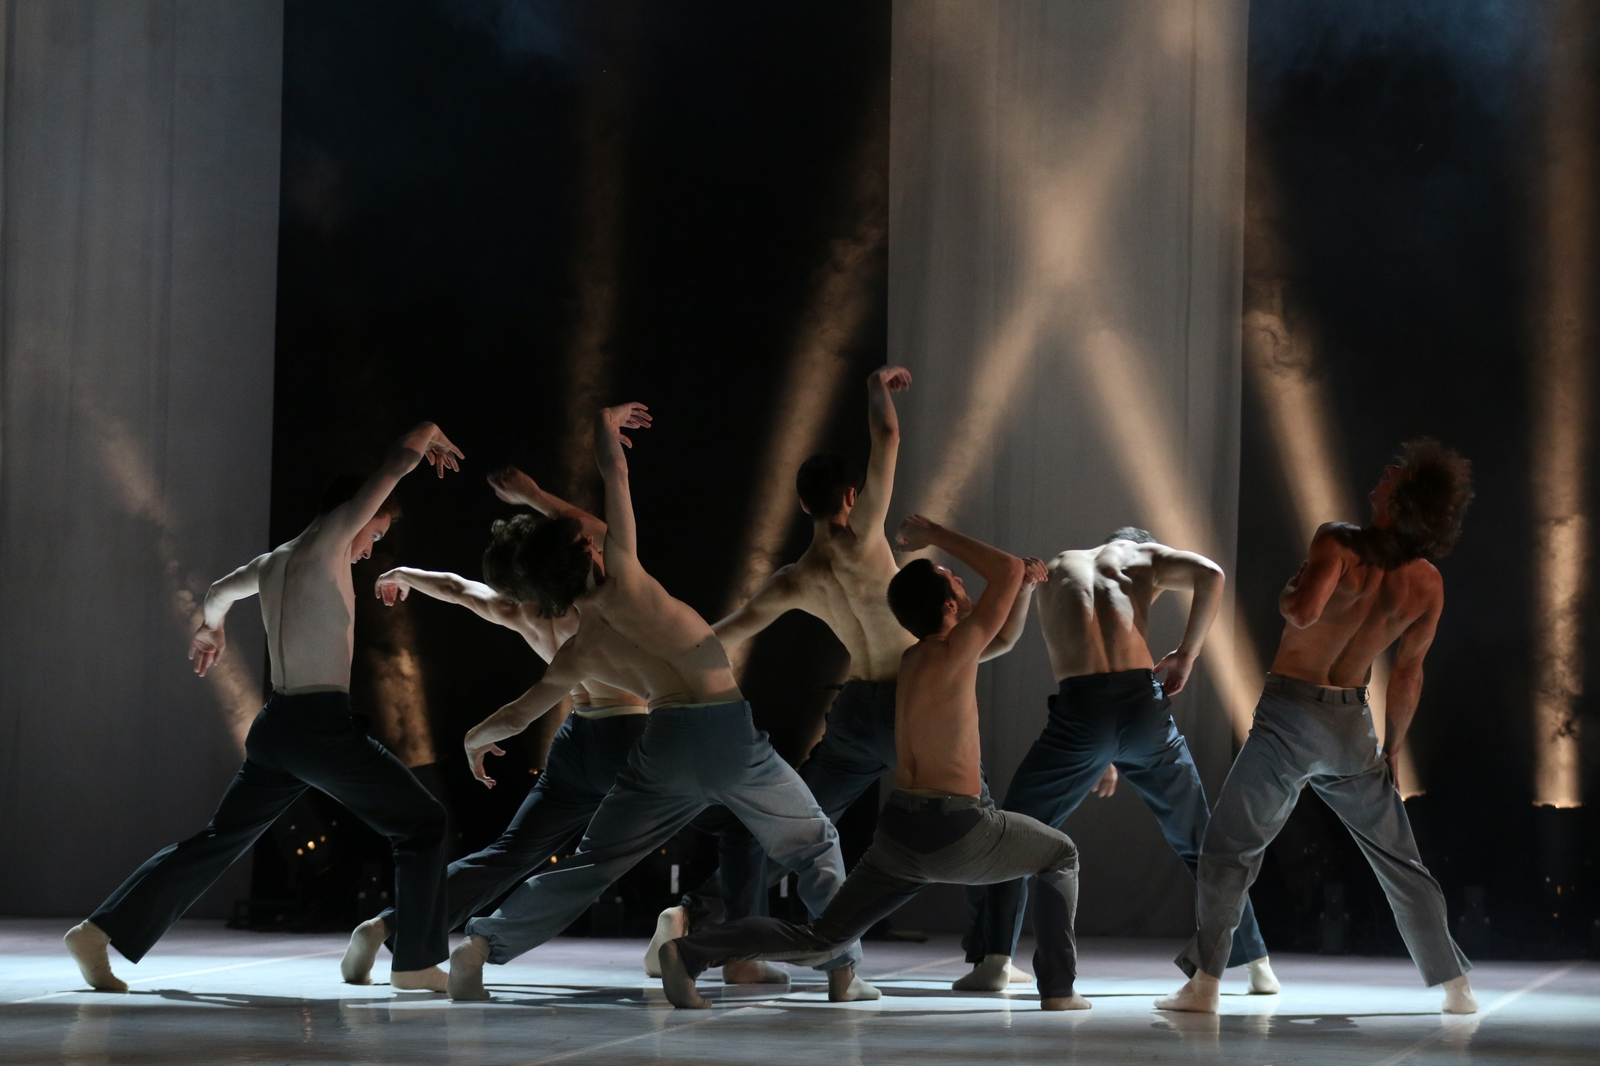 upoznavanje muških baletnih plesača